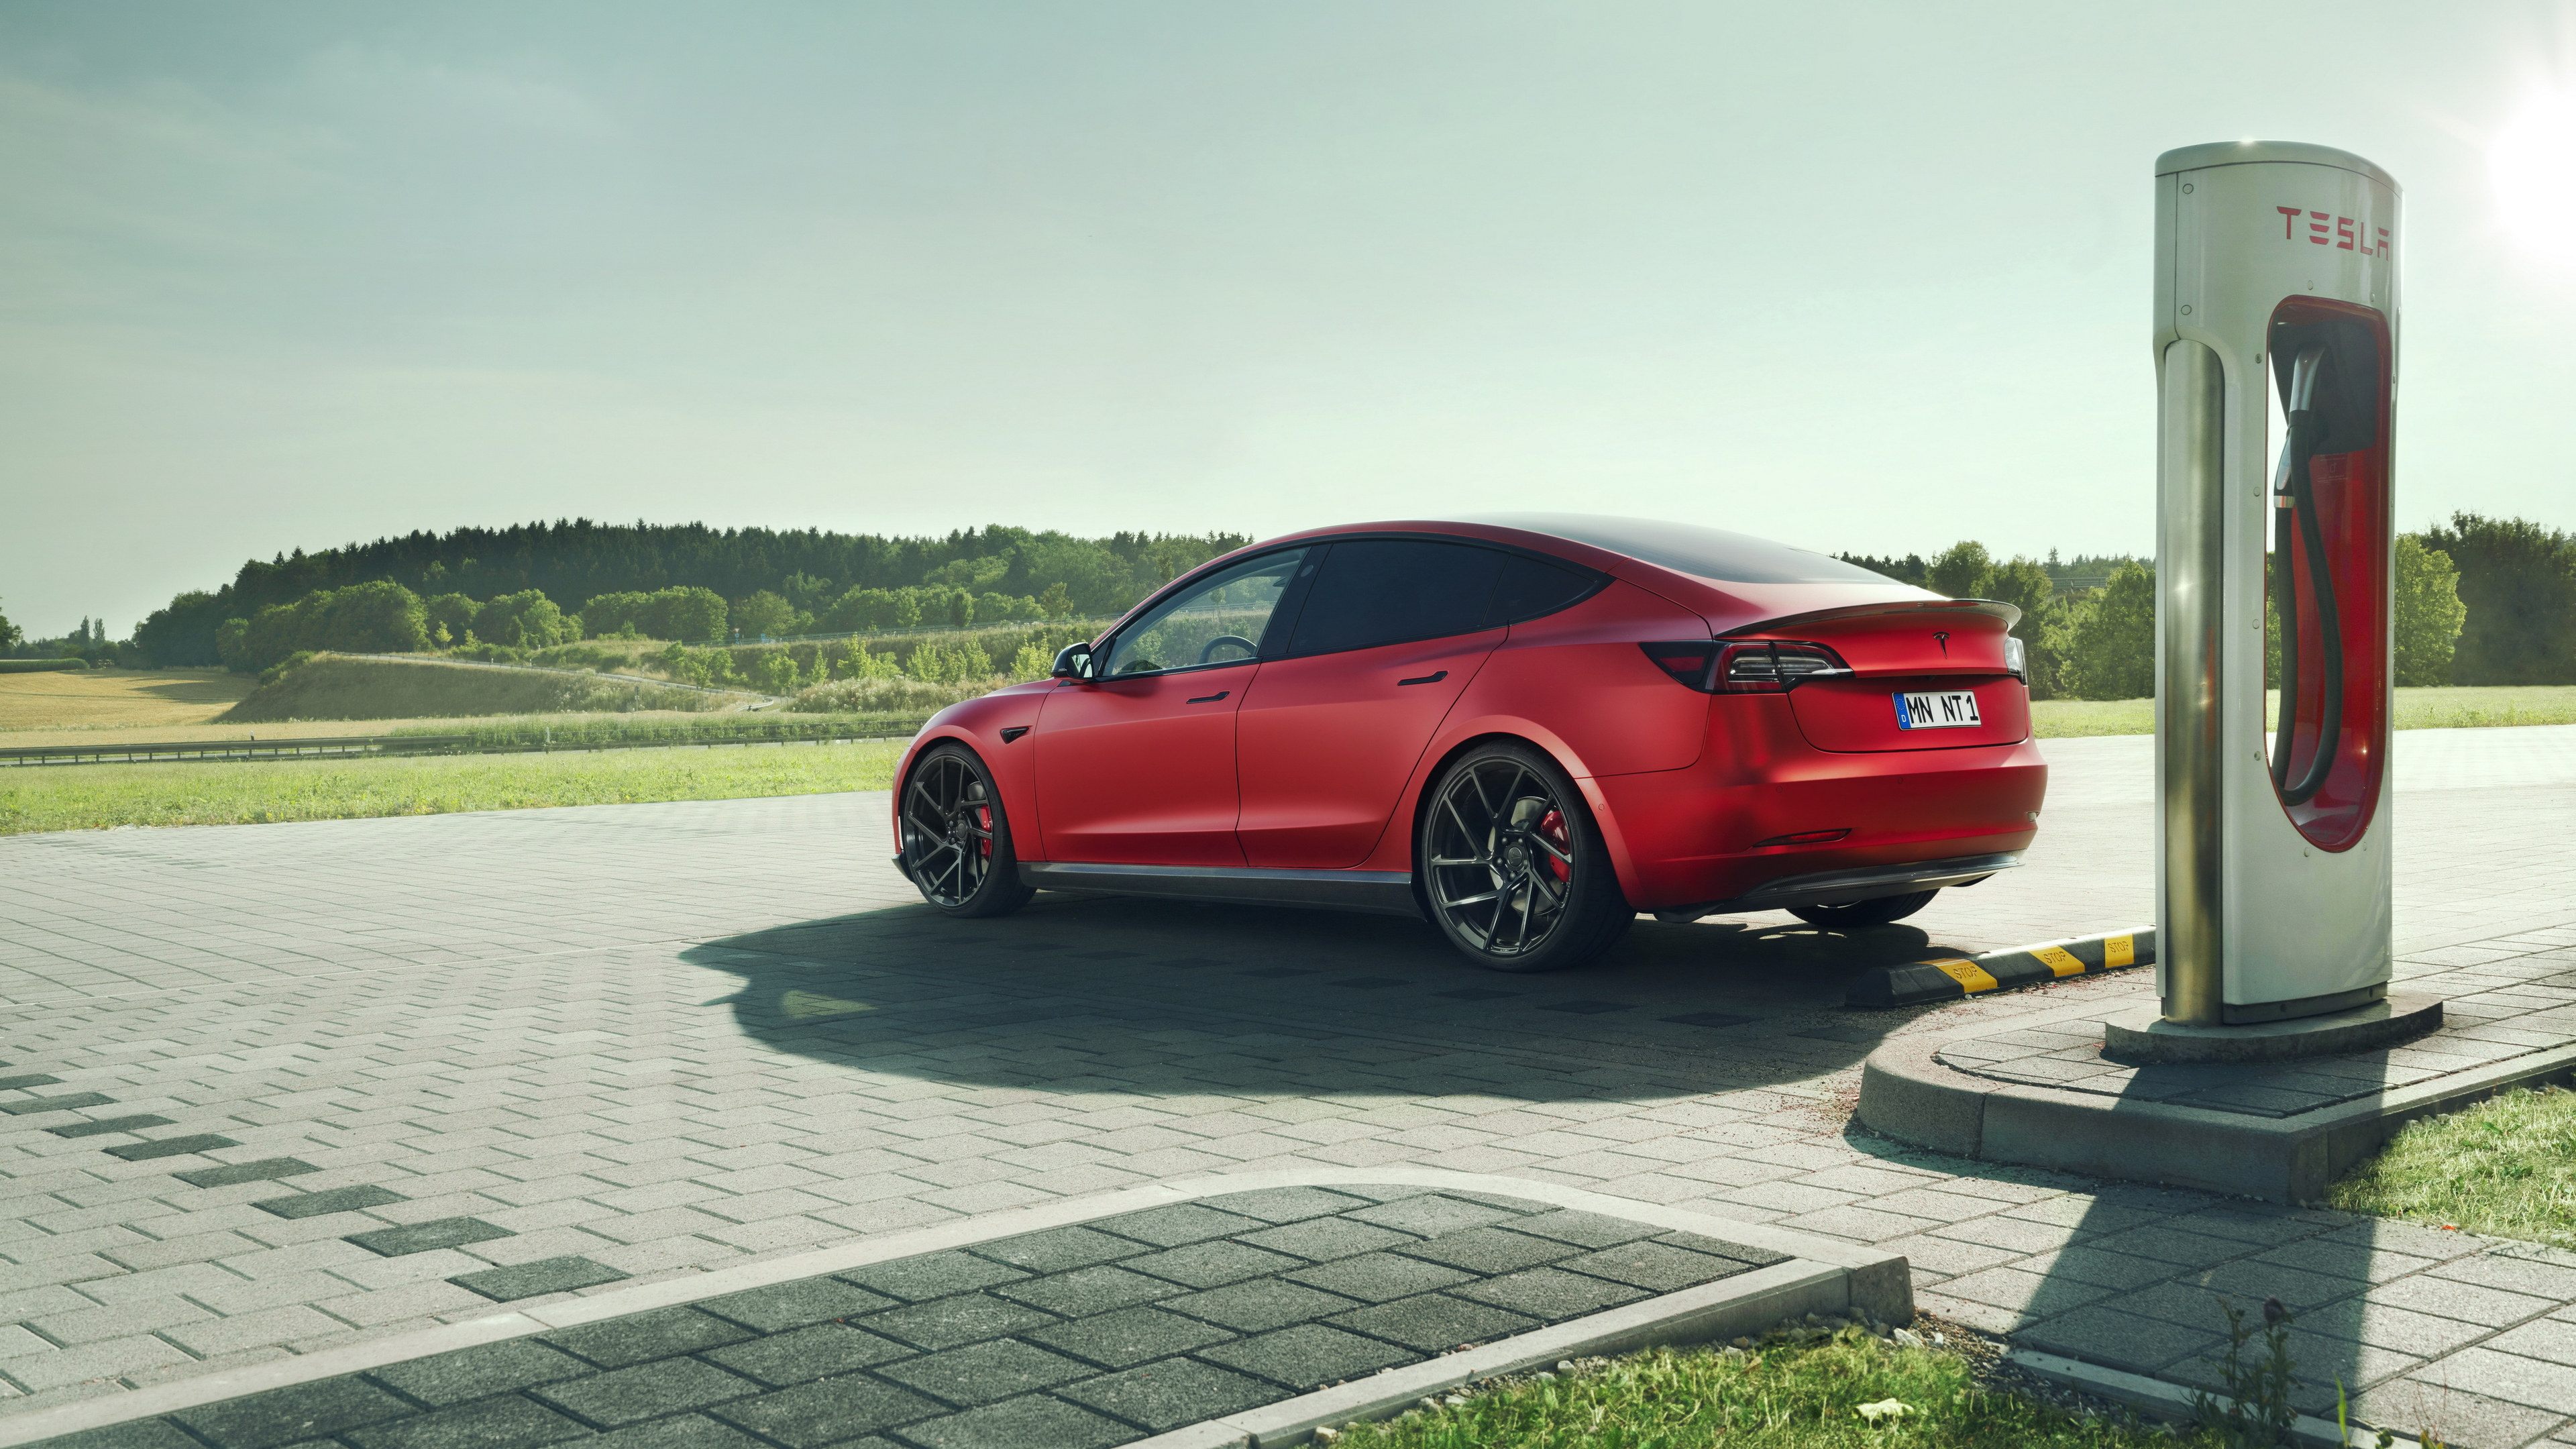 Wallpaper 4k Novitec Tesla Model 3 2019 Charging Port 2019